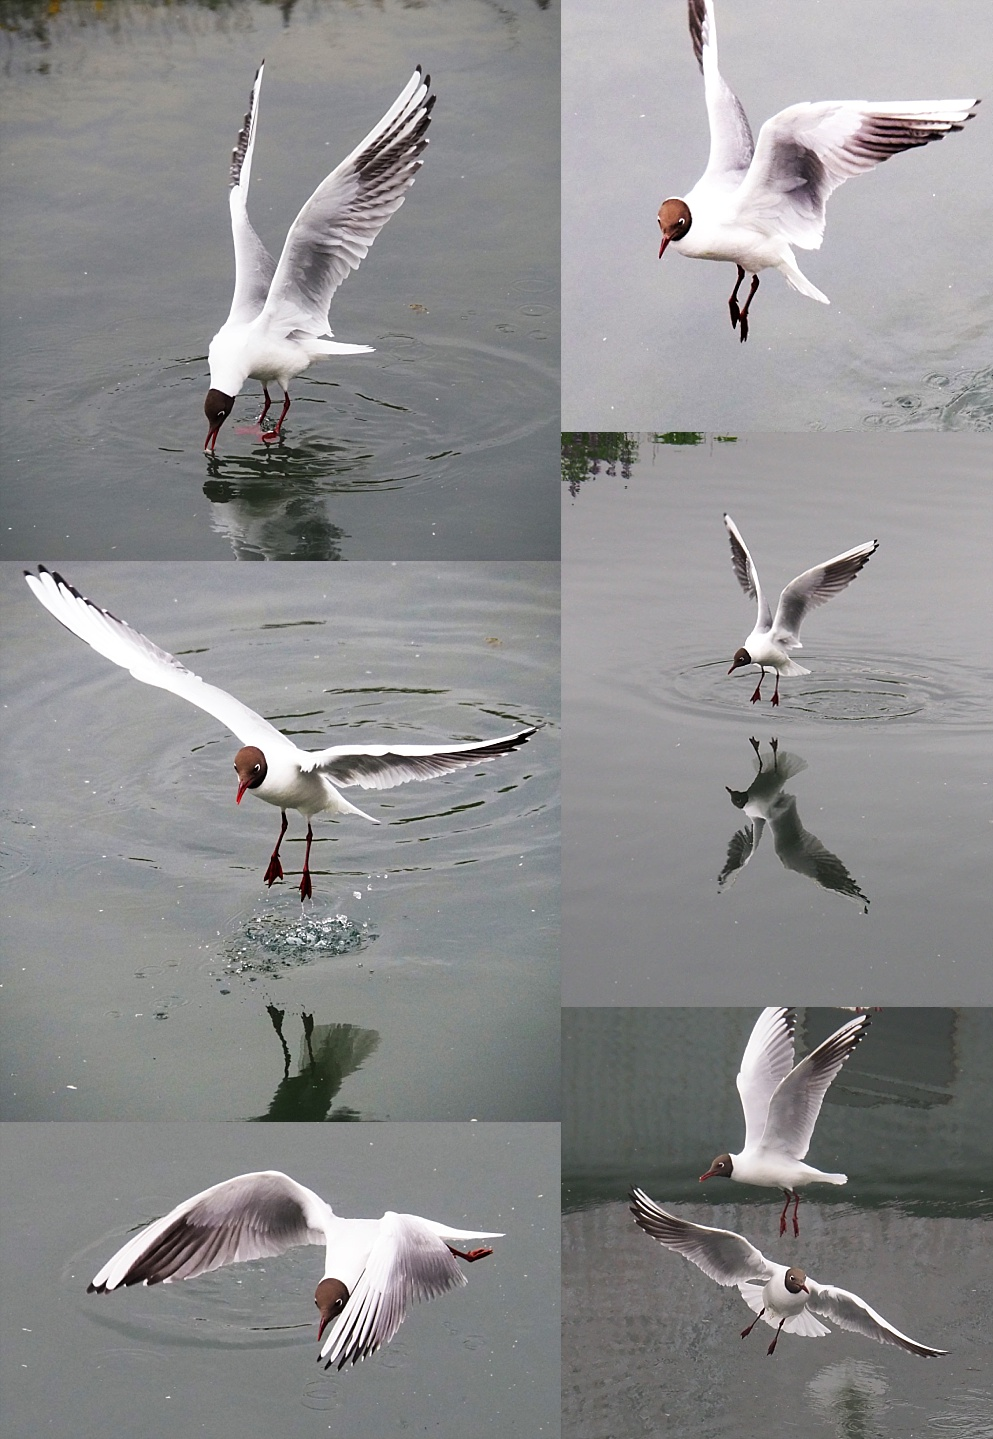 Collage of black-headed gulls in flight